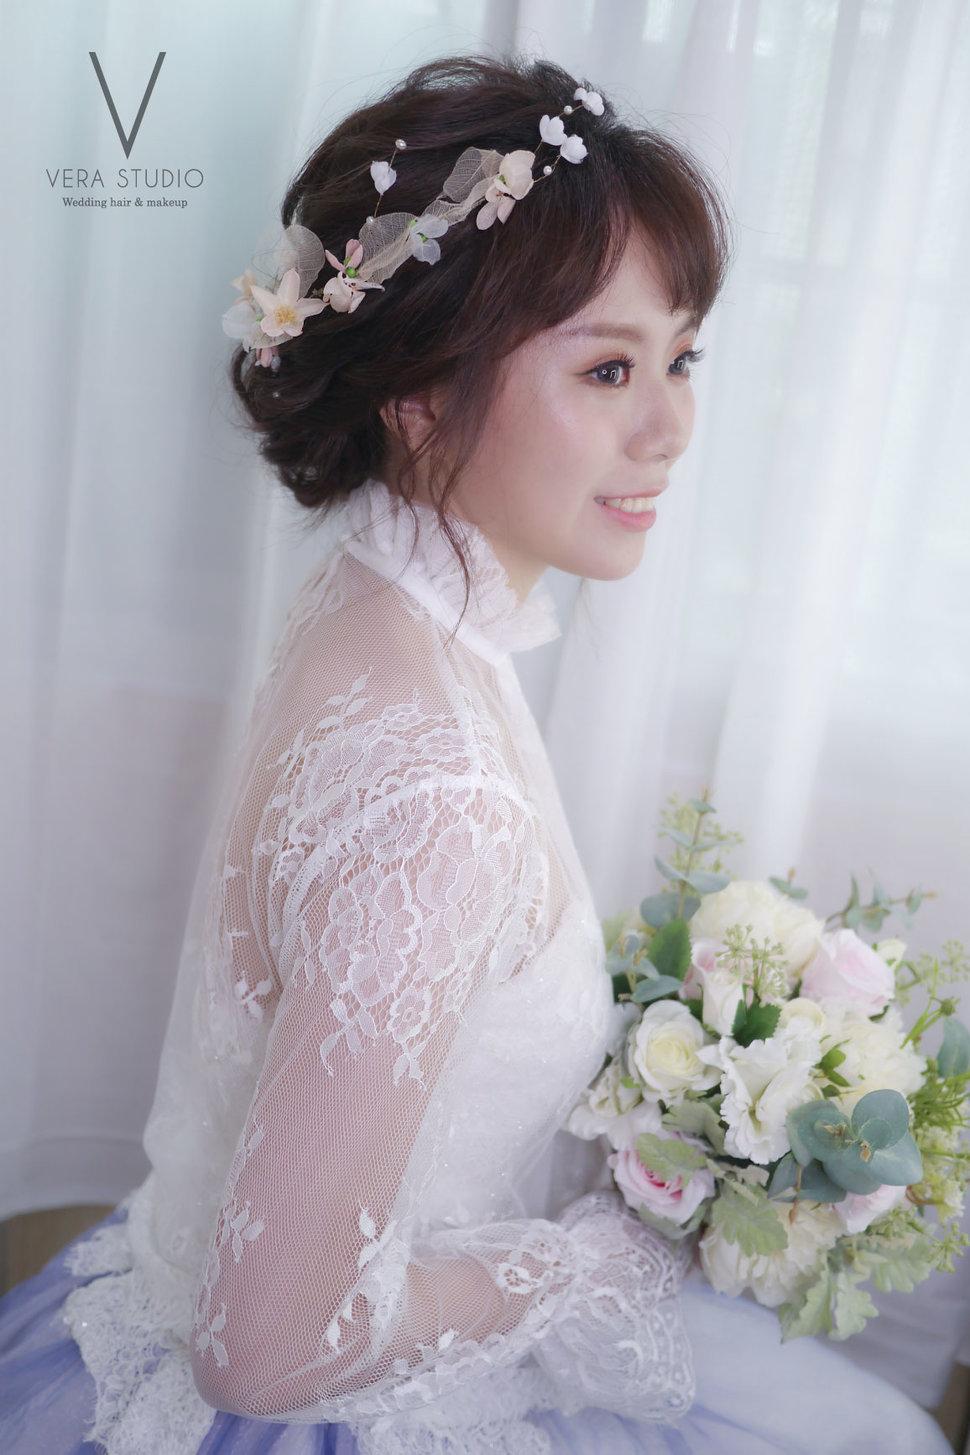 03 - Vera Studio 薇拉整體造型《結婚吧》